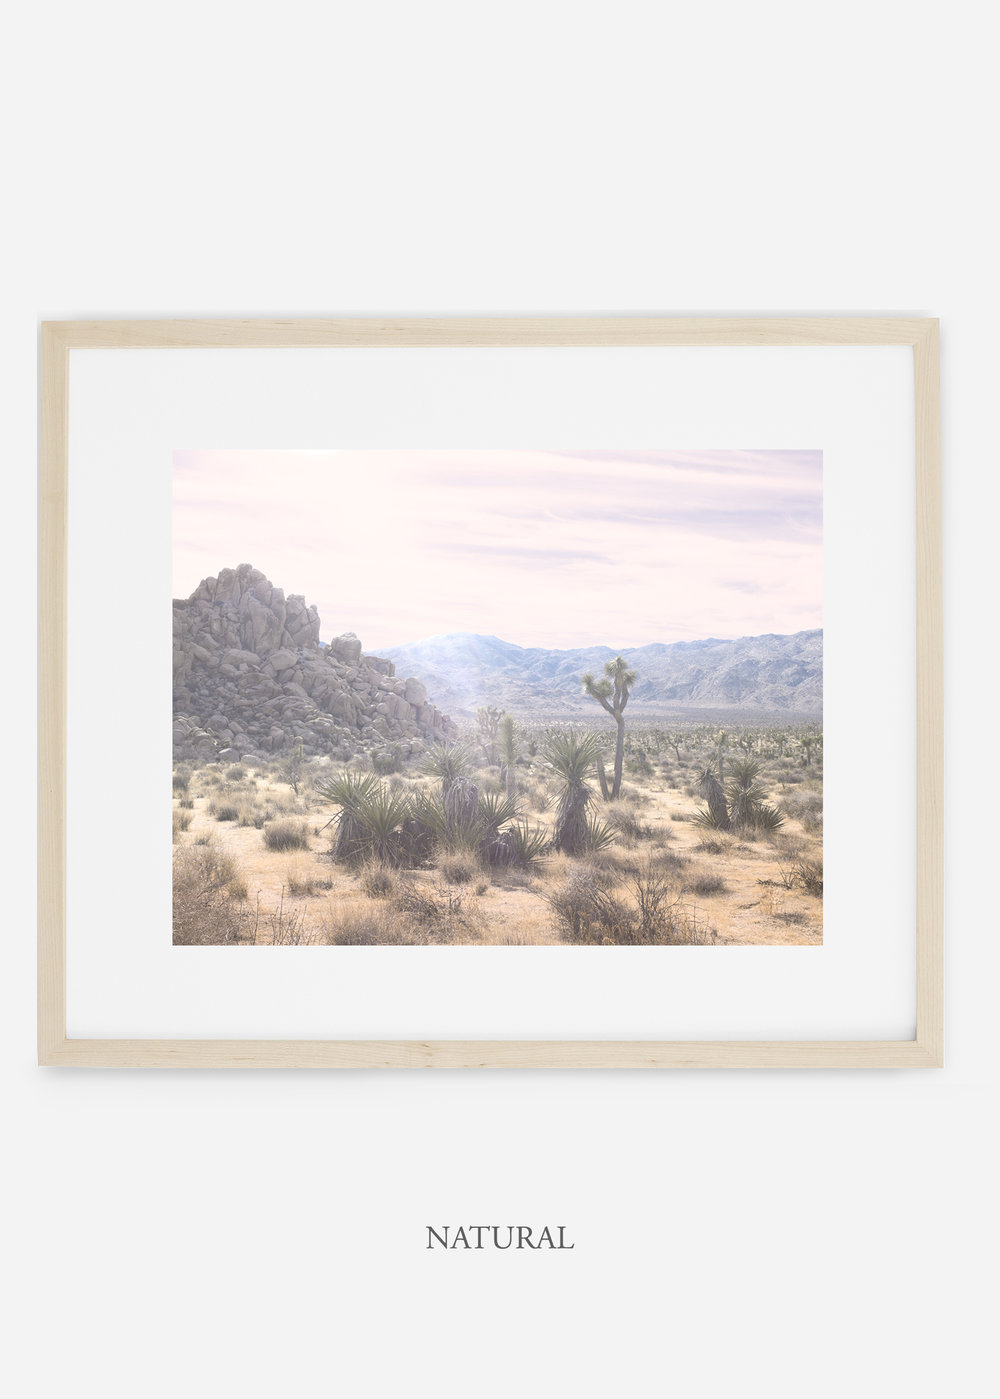 WilderCalifornia_naturalframe_JoshuaTree_No.9_interiordesign_prints_art.jpg